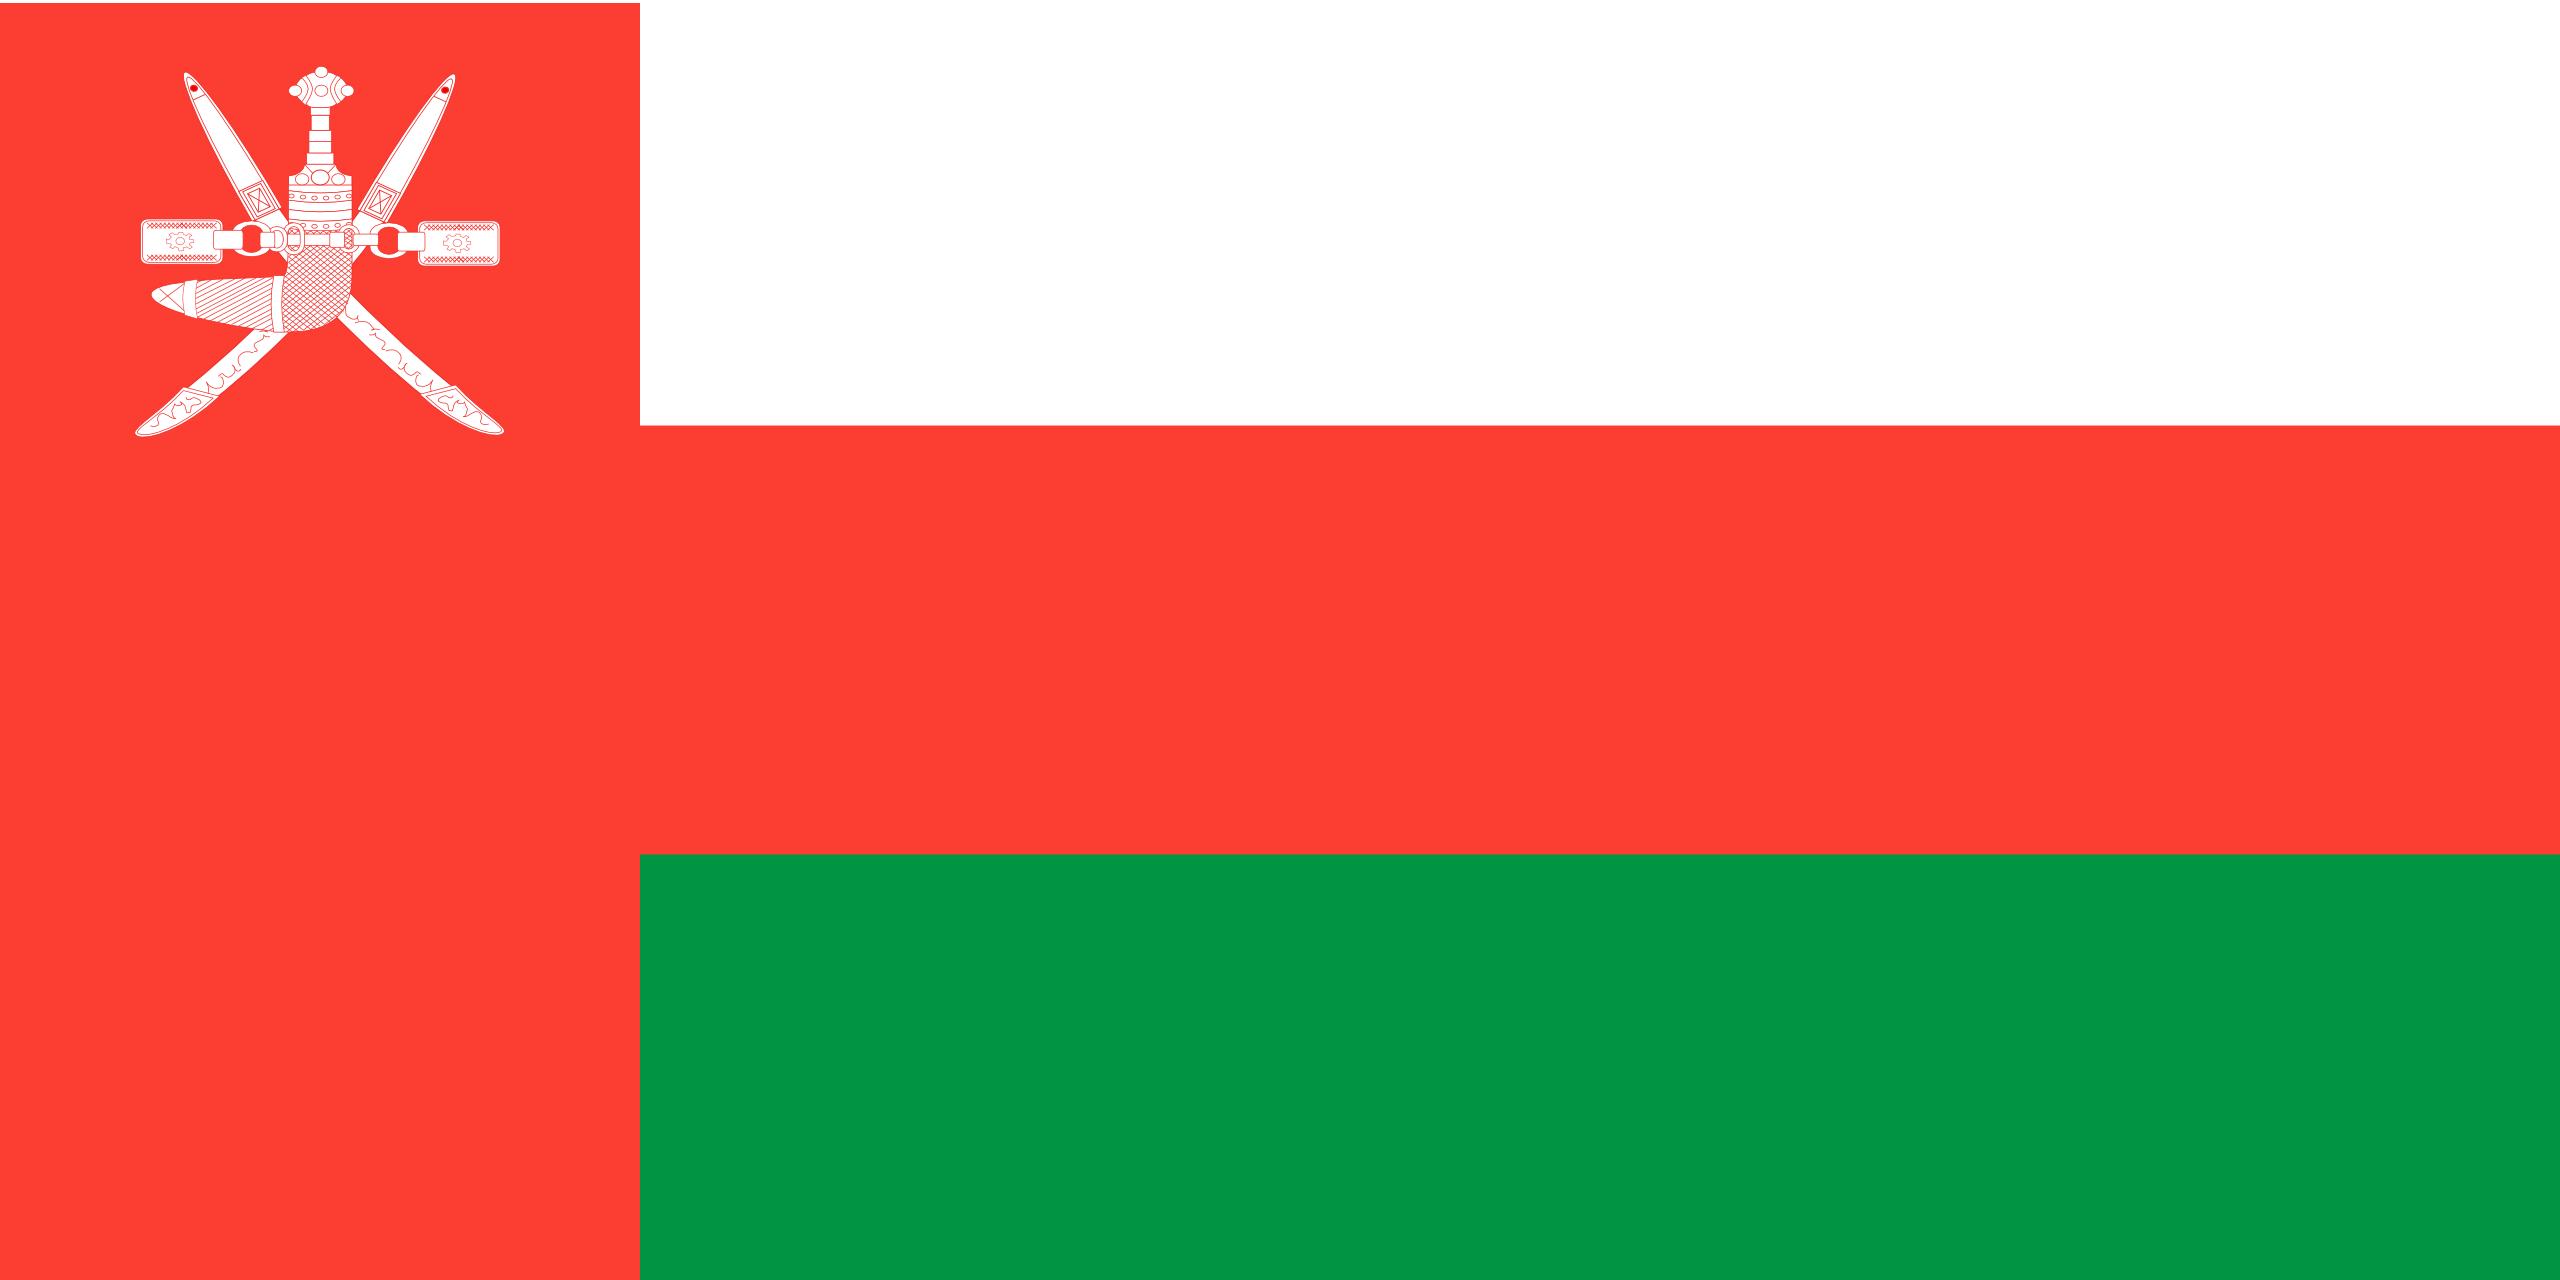 omán, país, emblema, insignia, σύμβολο - Wallpapers HD - Professor-falken.com